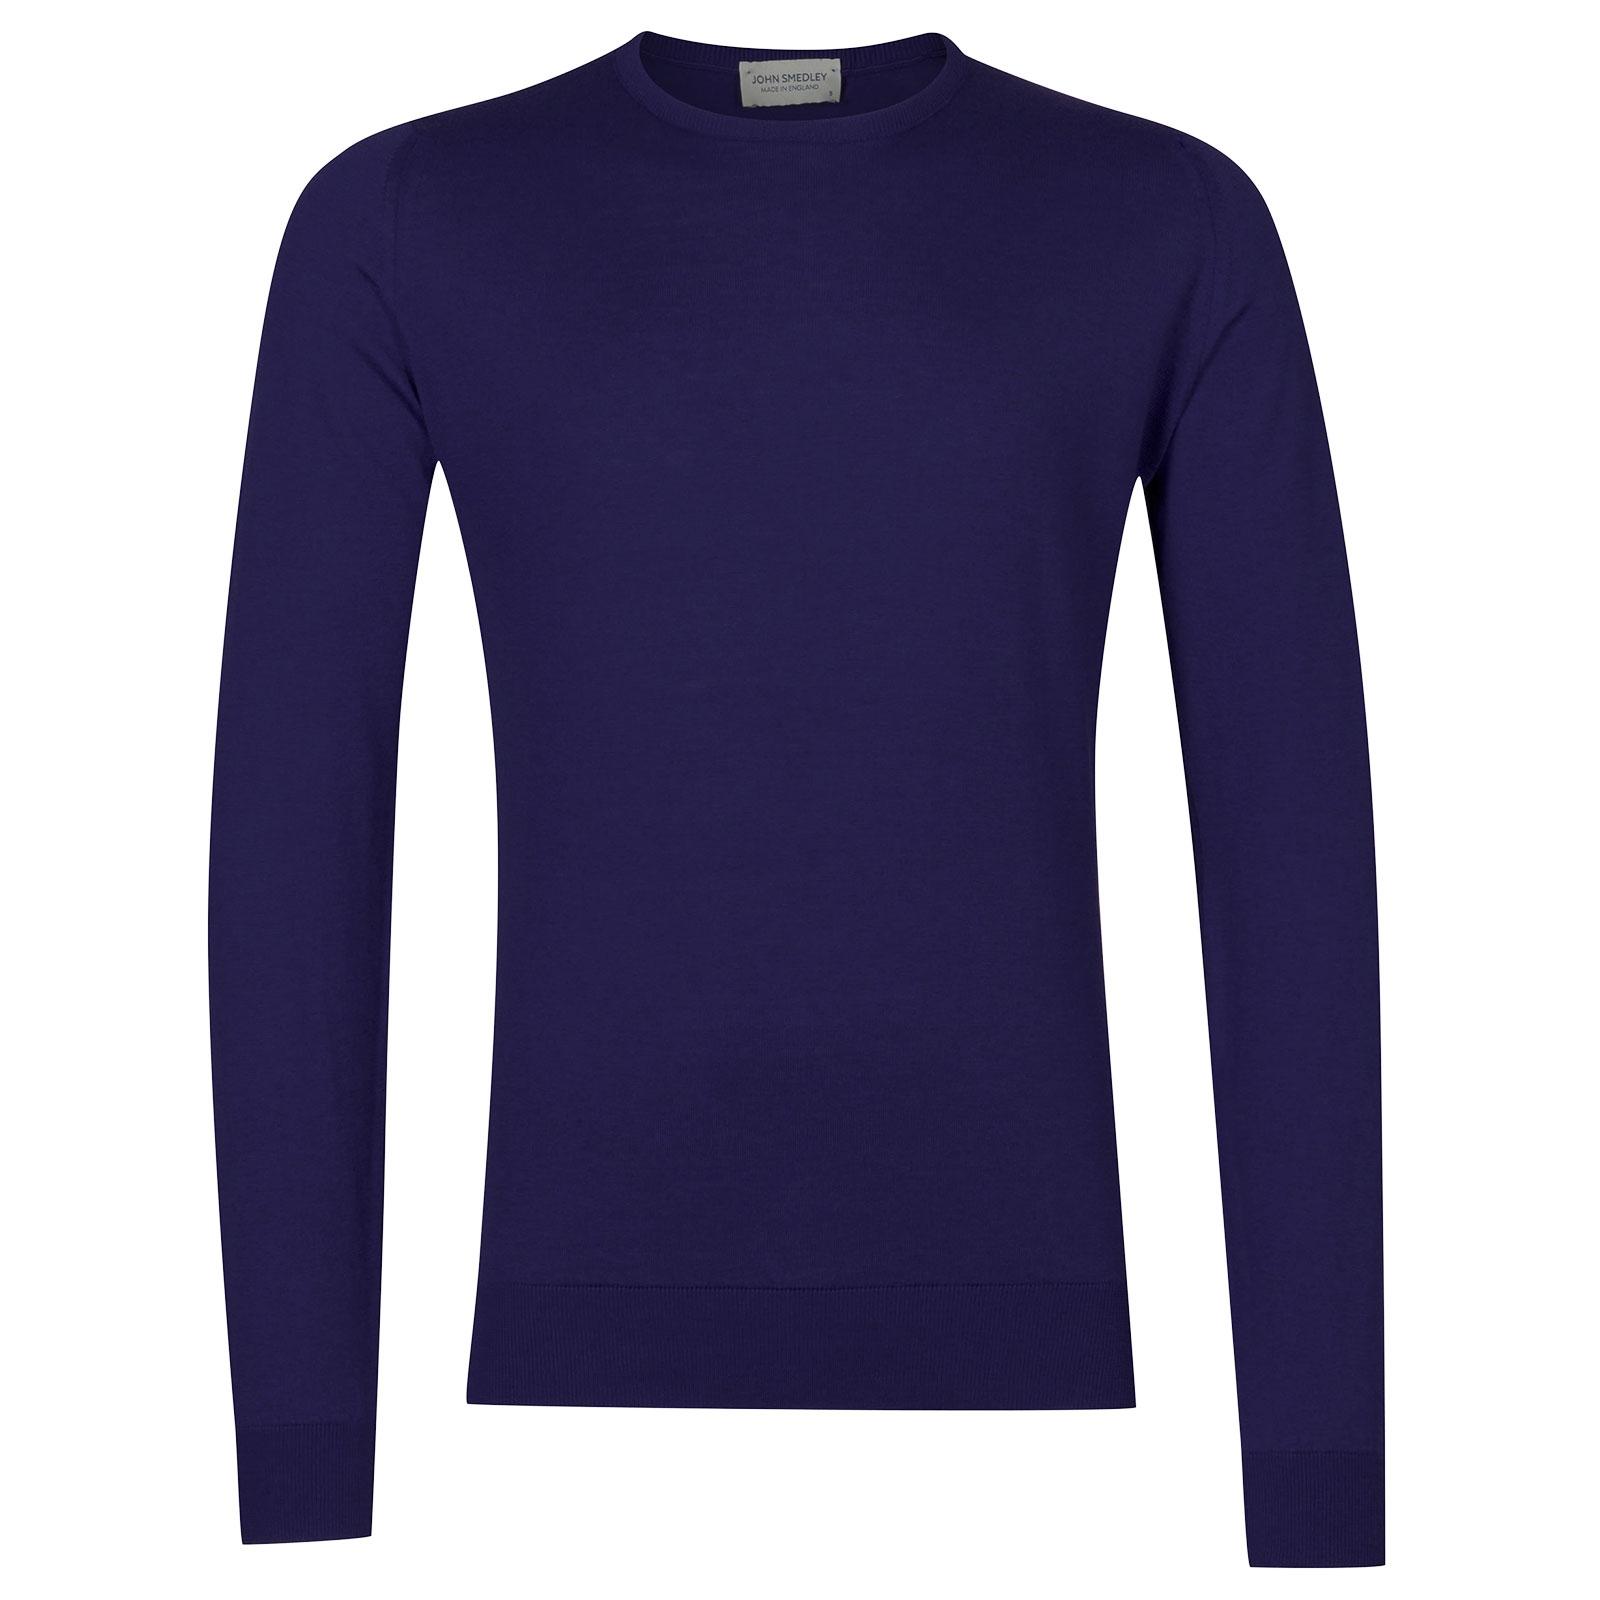 John Smedley HatfieldSea Island Cotton Pullover in Serge Blue-M